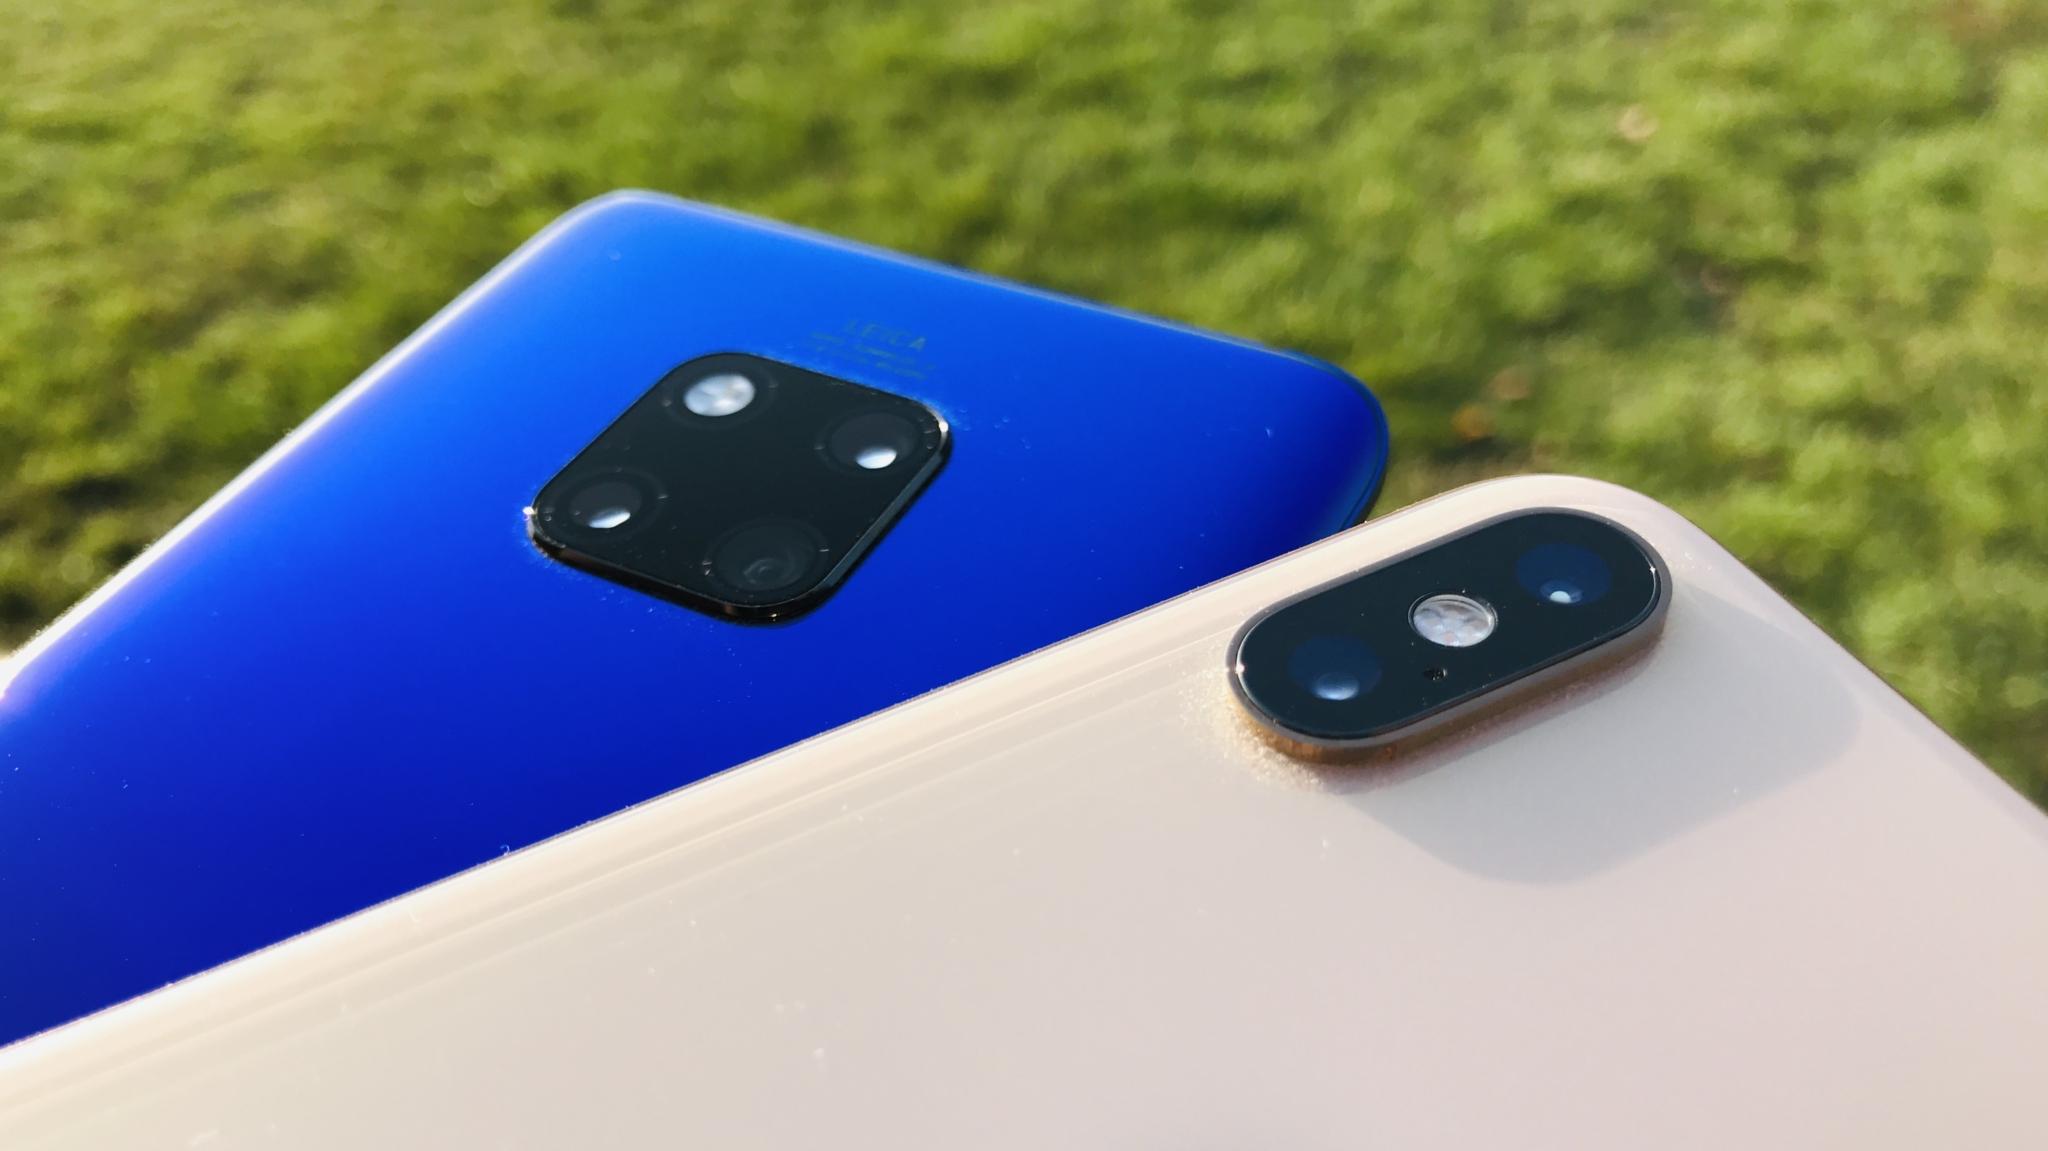 Fototest: iPhone Xs Max vs. Mate 20 Pro